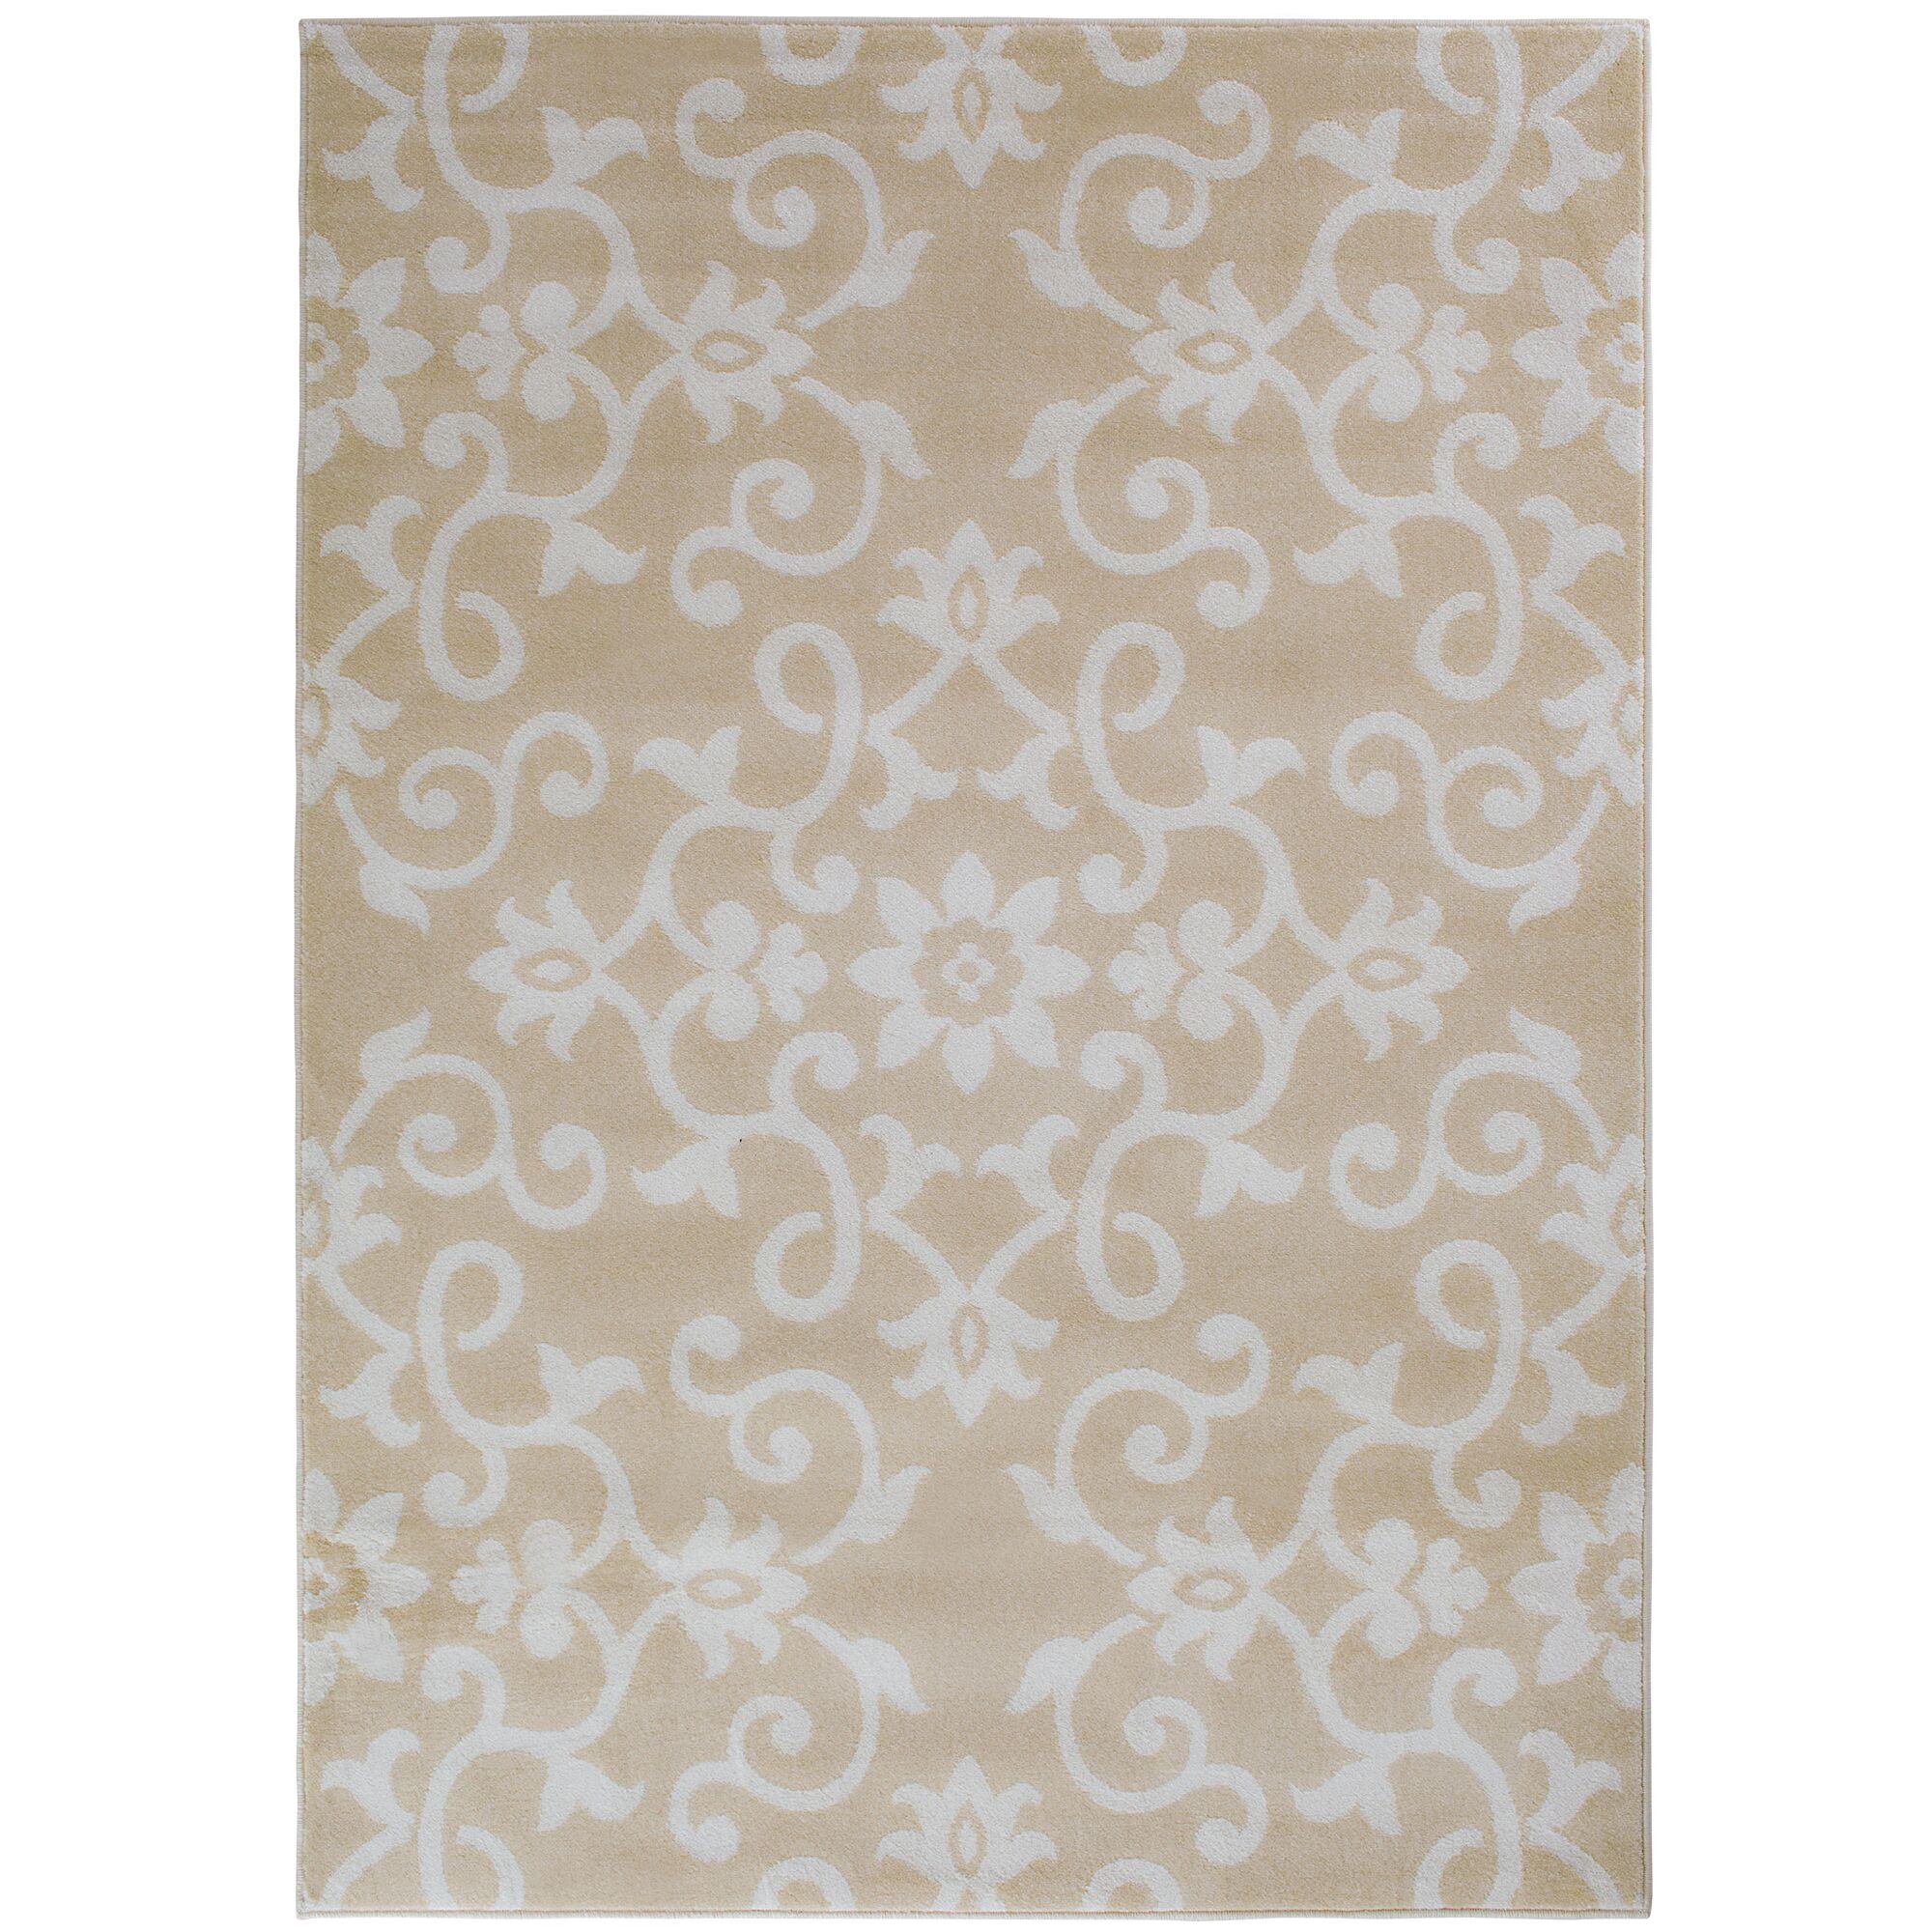 Eibhlin Snow/Buff Beige/Cream Area Rug Rug Size: Rectangle 5'3